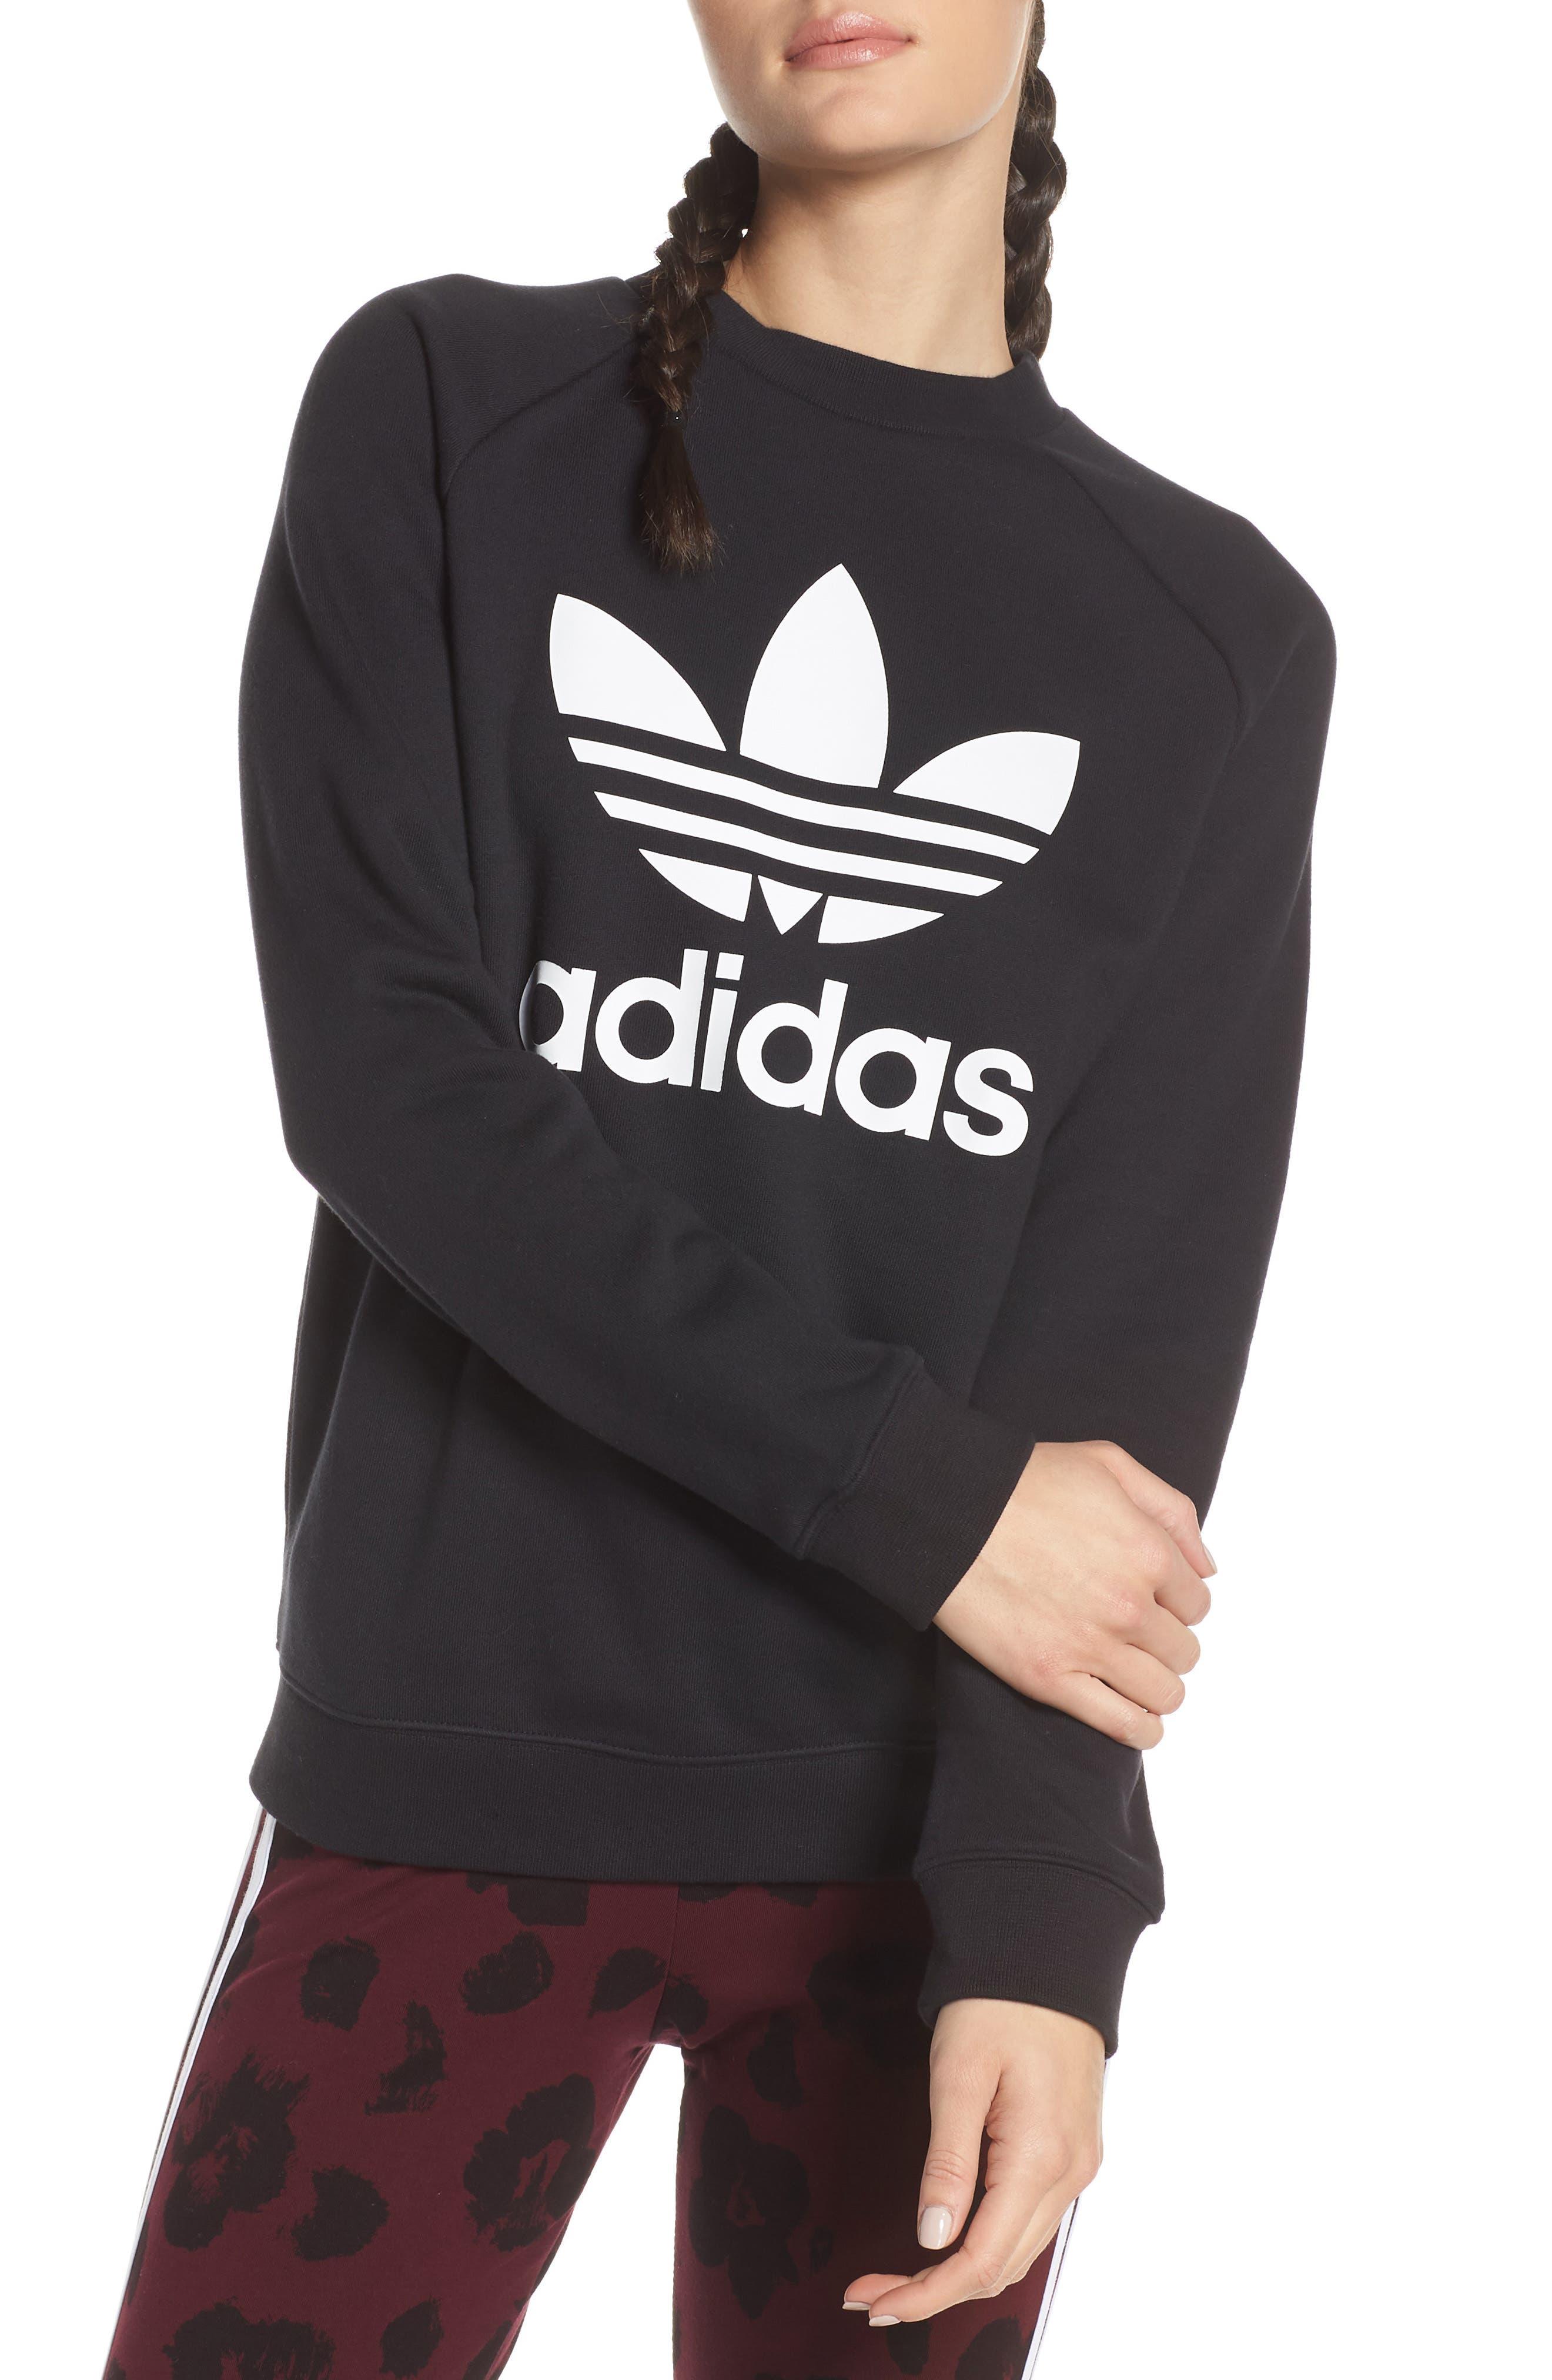 ADIDAS ORIGINALS, Trefoil Sweatshirt, Main thumbnail 1, color, 001